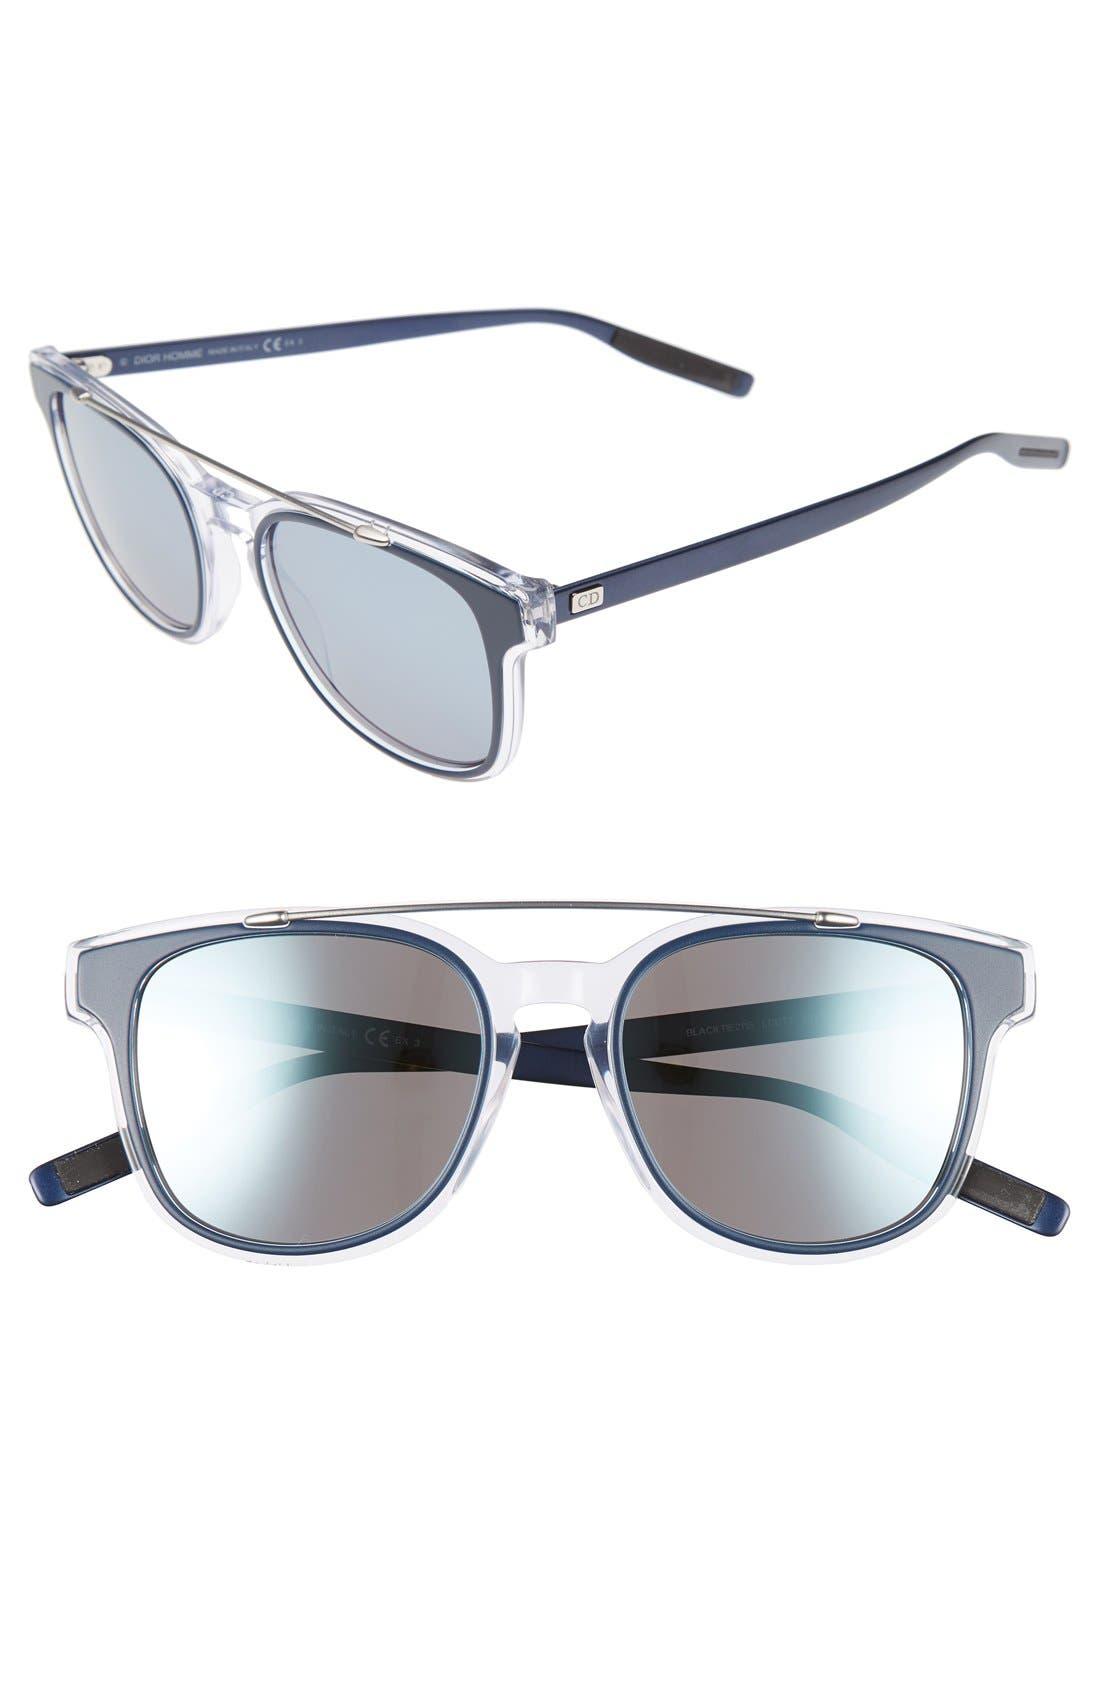 DIOR HOMME Black Tie 52mm Sunglasses